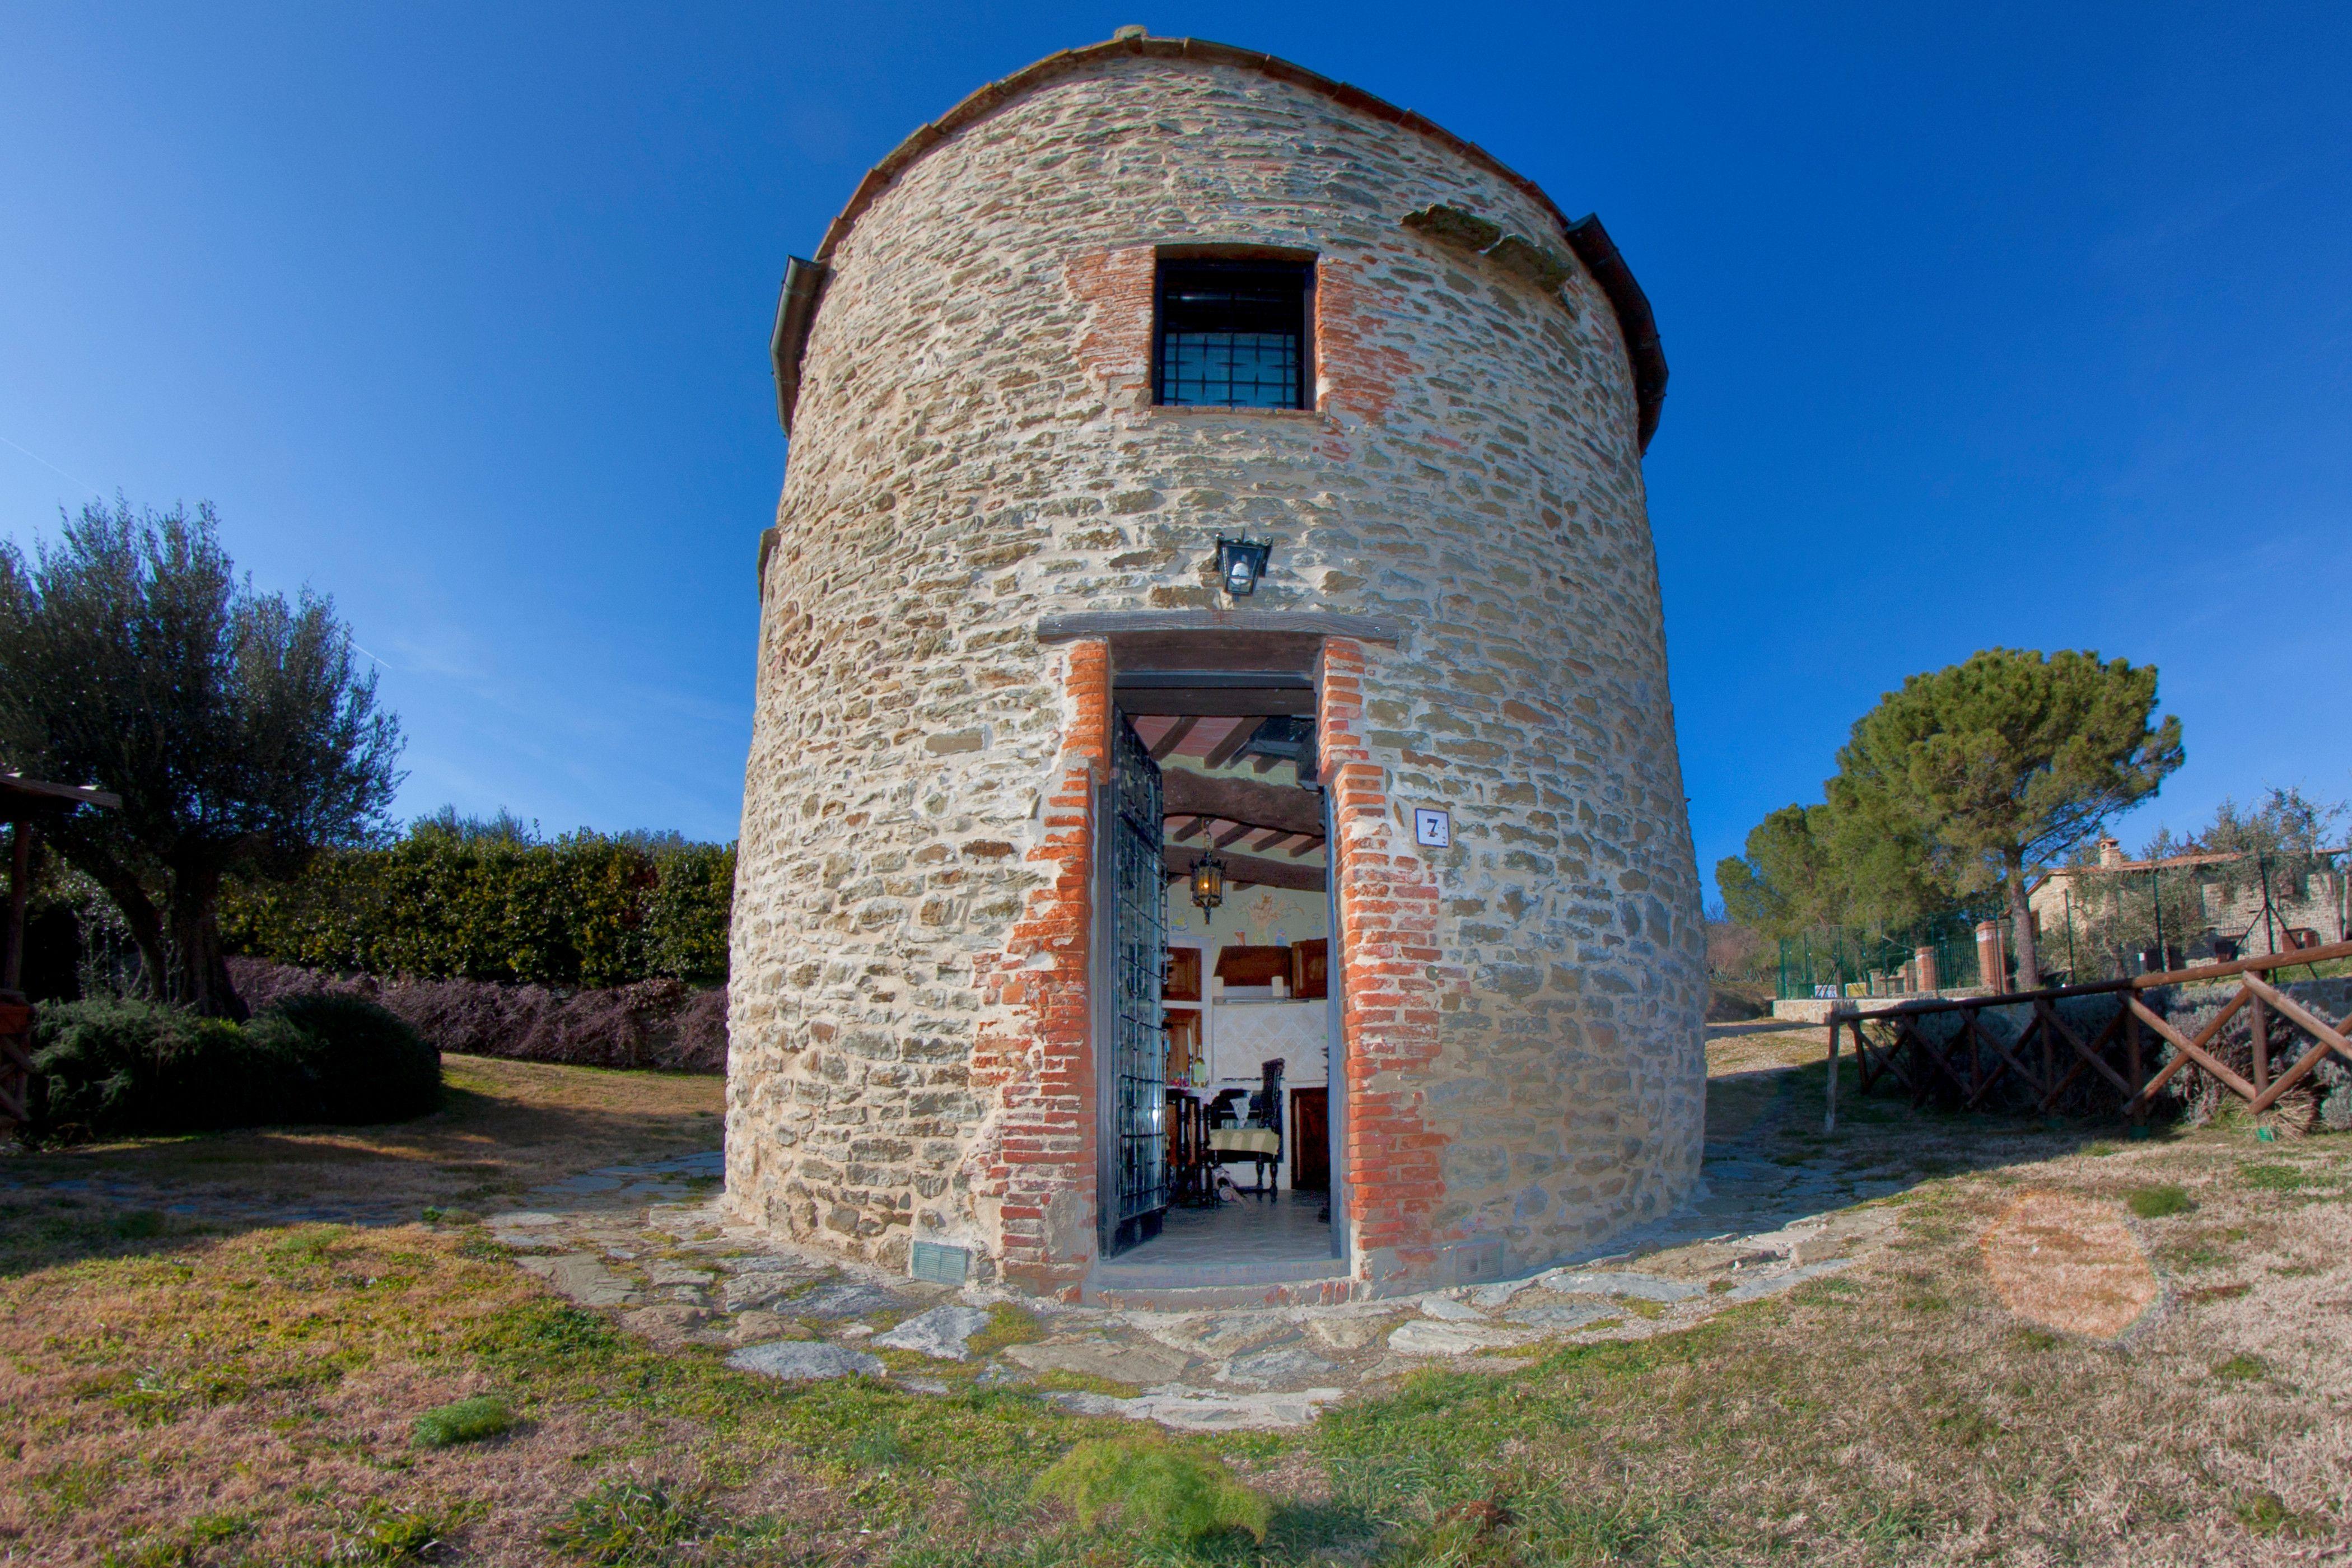 Old Tower, Lake View, Swimming Pool, Tuoro sul Trasimeno, Umbria, Italy